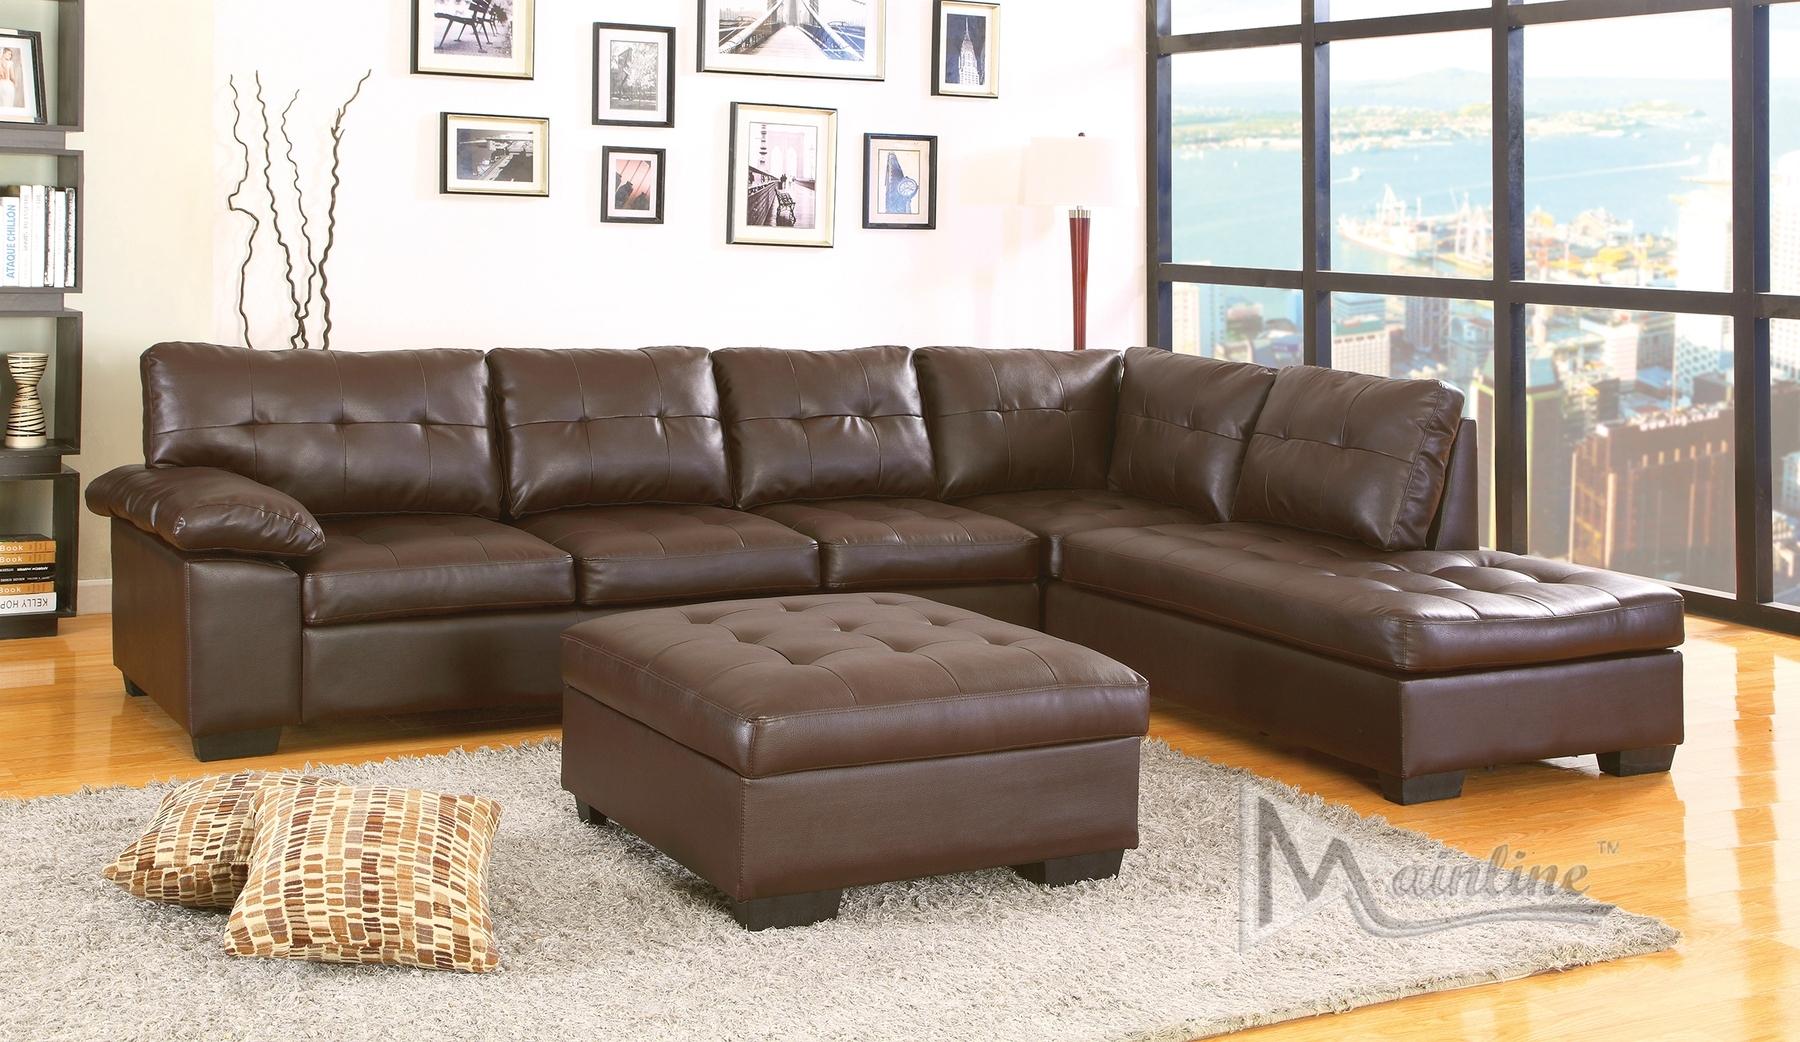 Dallas Chocolate Sectional Sofa 70130 Mainline Inc Sectional Sofas With Chocolate Sectional Sofas (View 9 of 10)